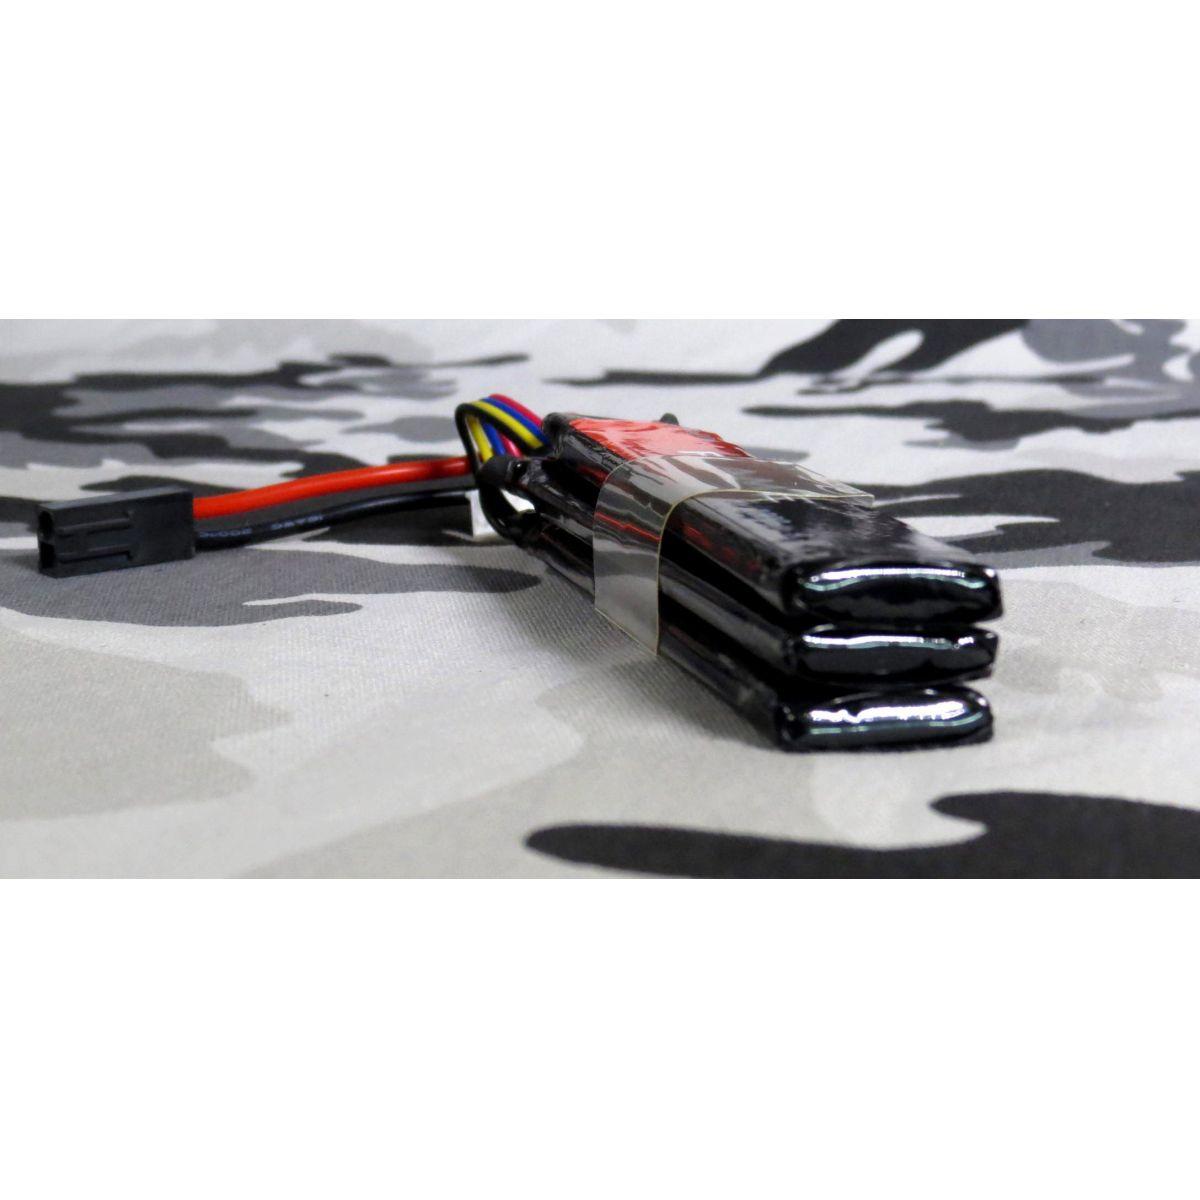 Bateria Li-Fe Flame 9.9V 15C - 1000 mAh (3 tabletes)  - MAB AIRSOFT